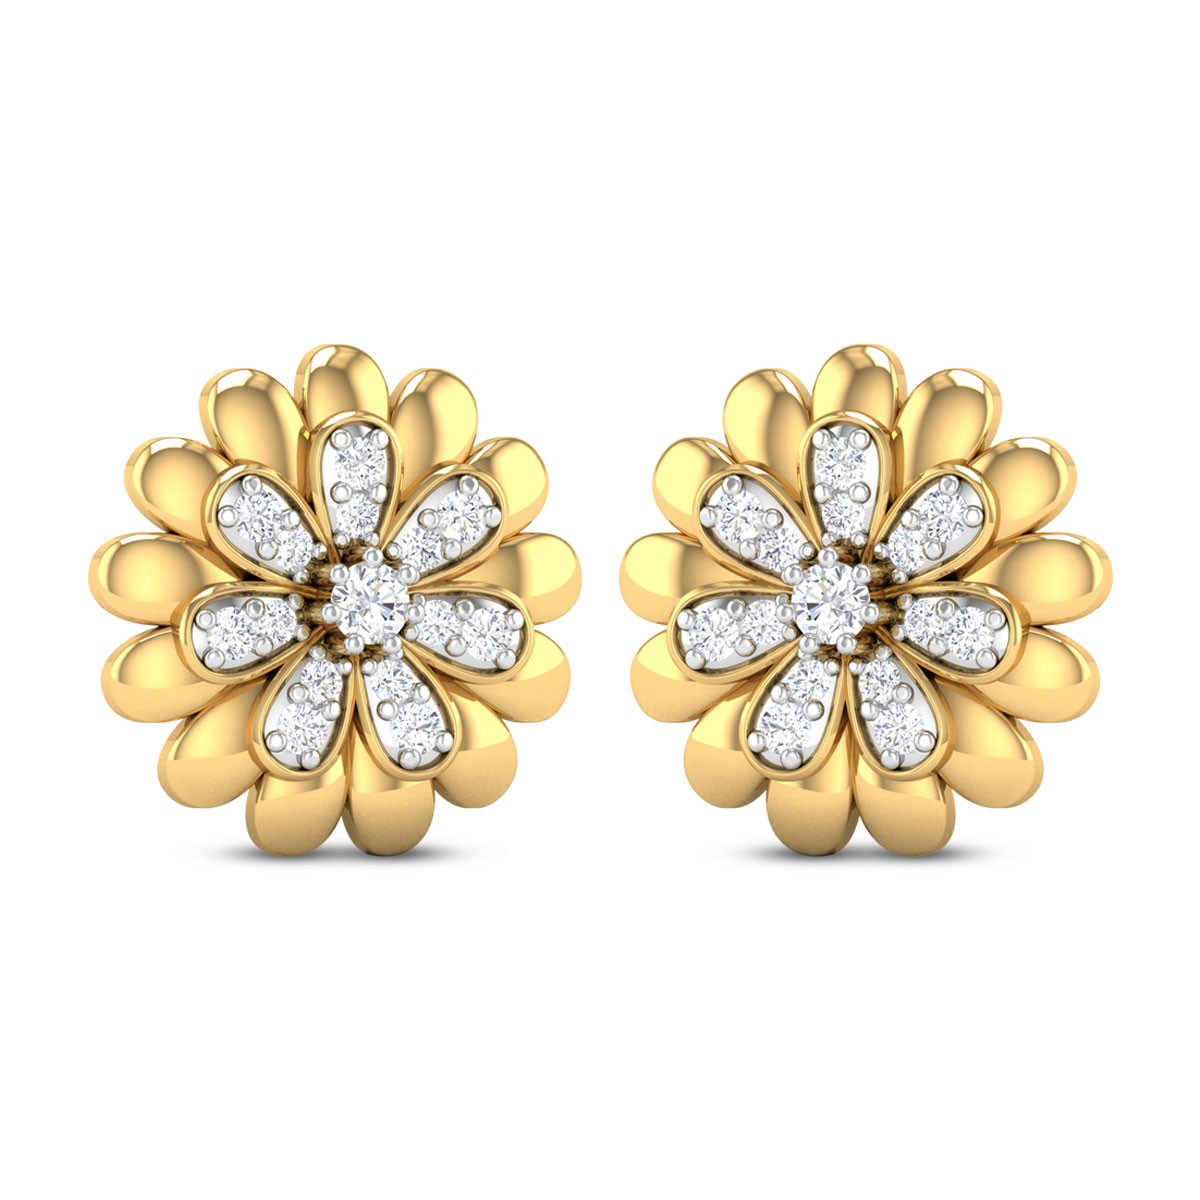 Agrata Dual Layer Floral Diamond Stud Earrings